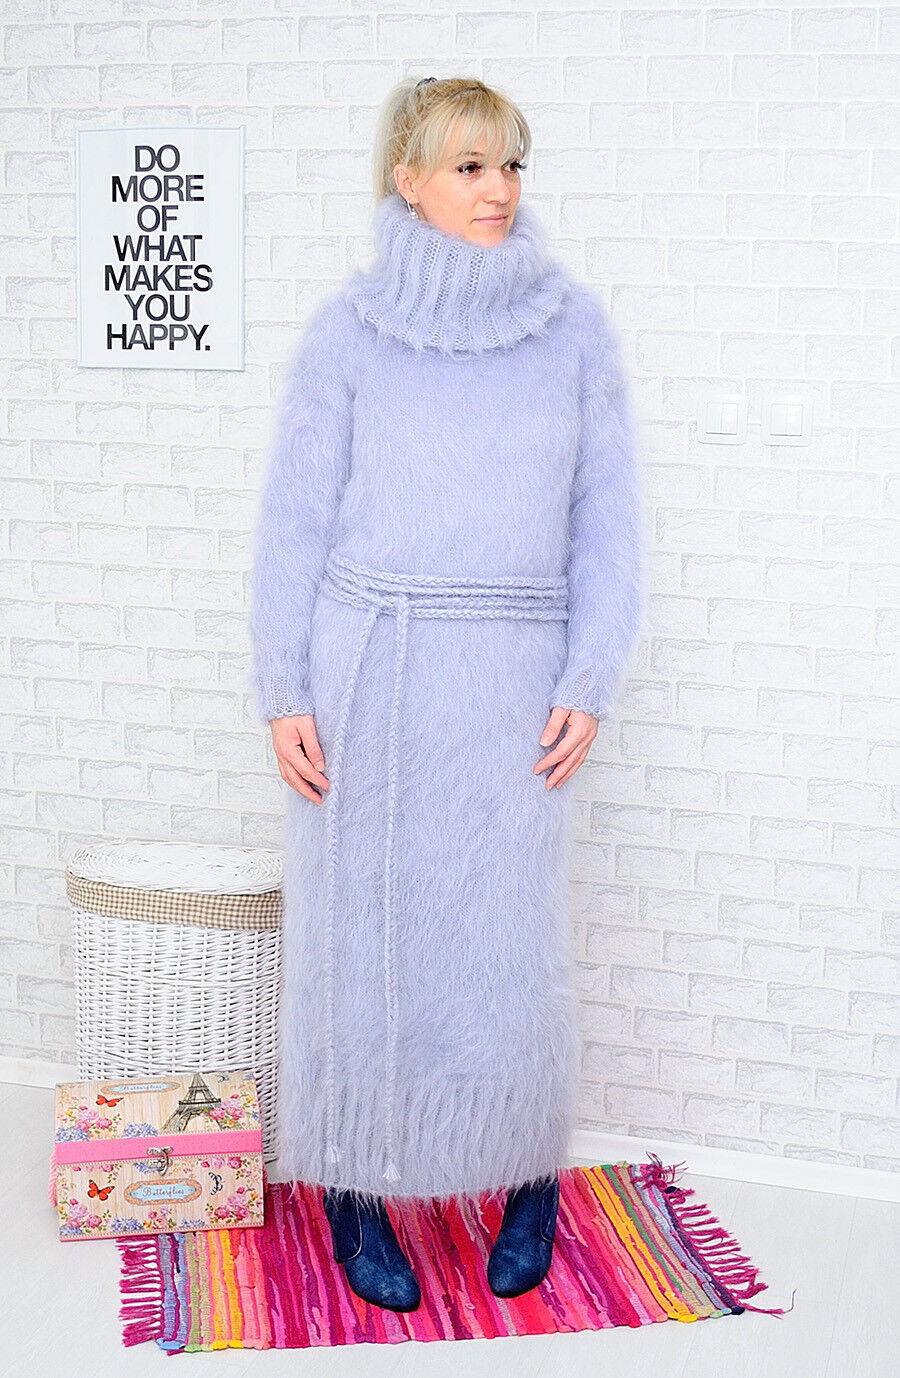 MOHAIR Hand Knitted Kleid + Belt   Robe grau Handmade New SALE  ️